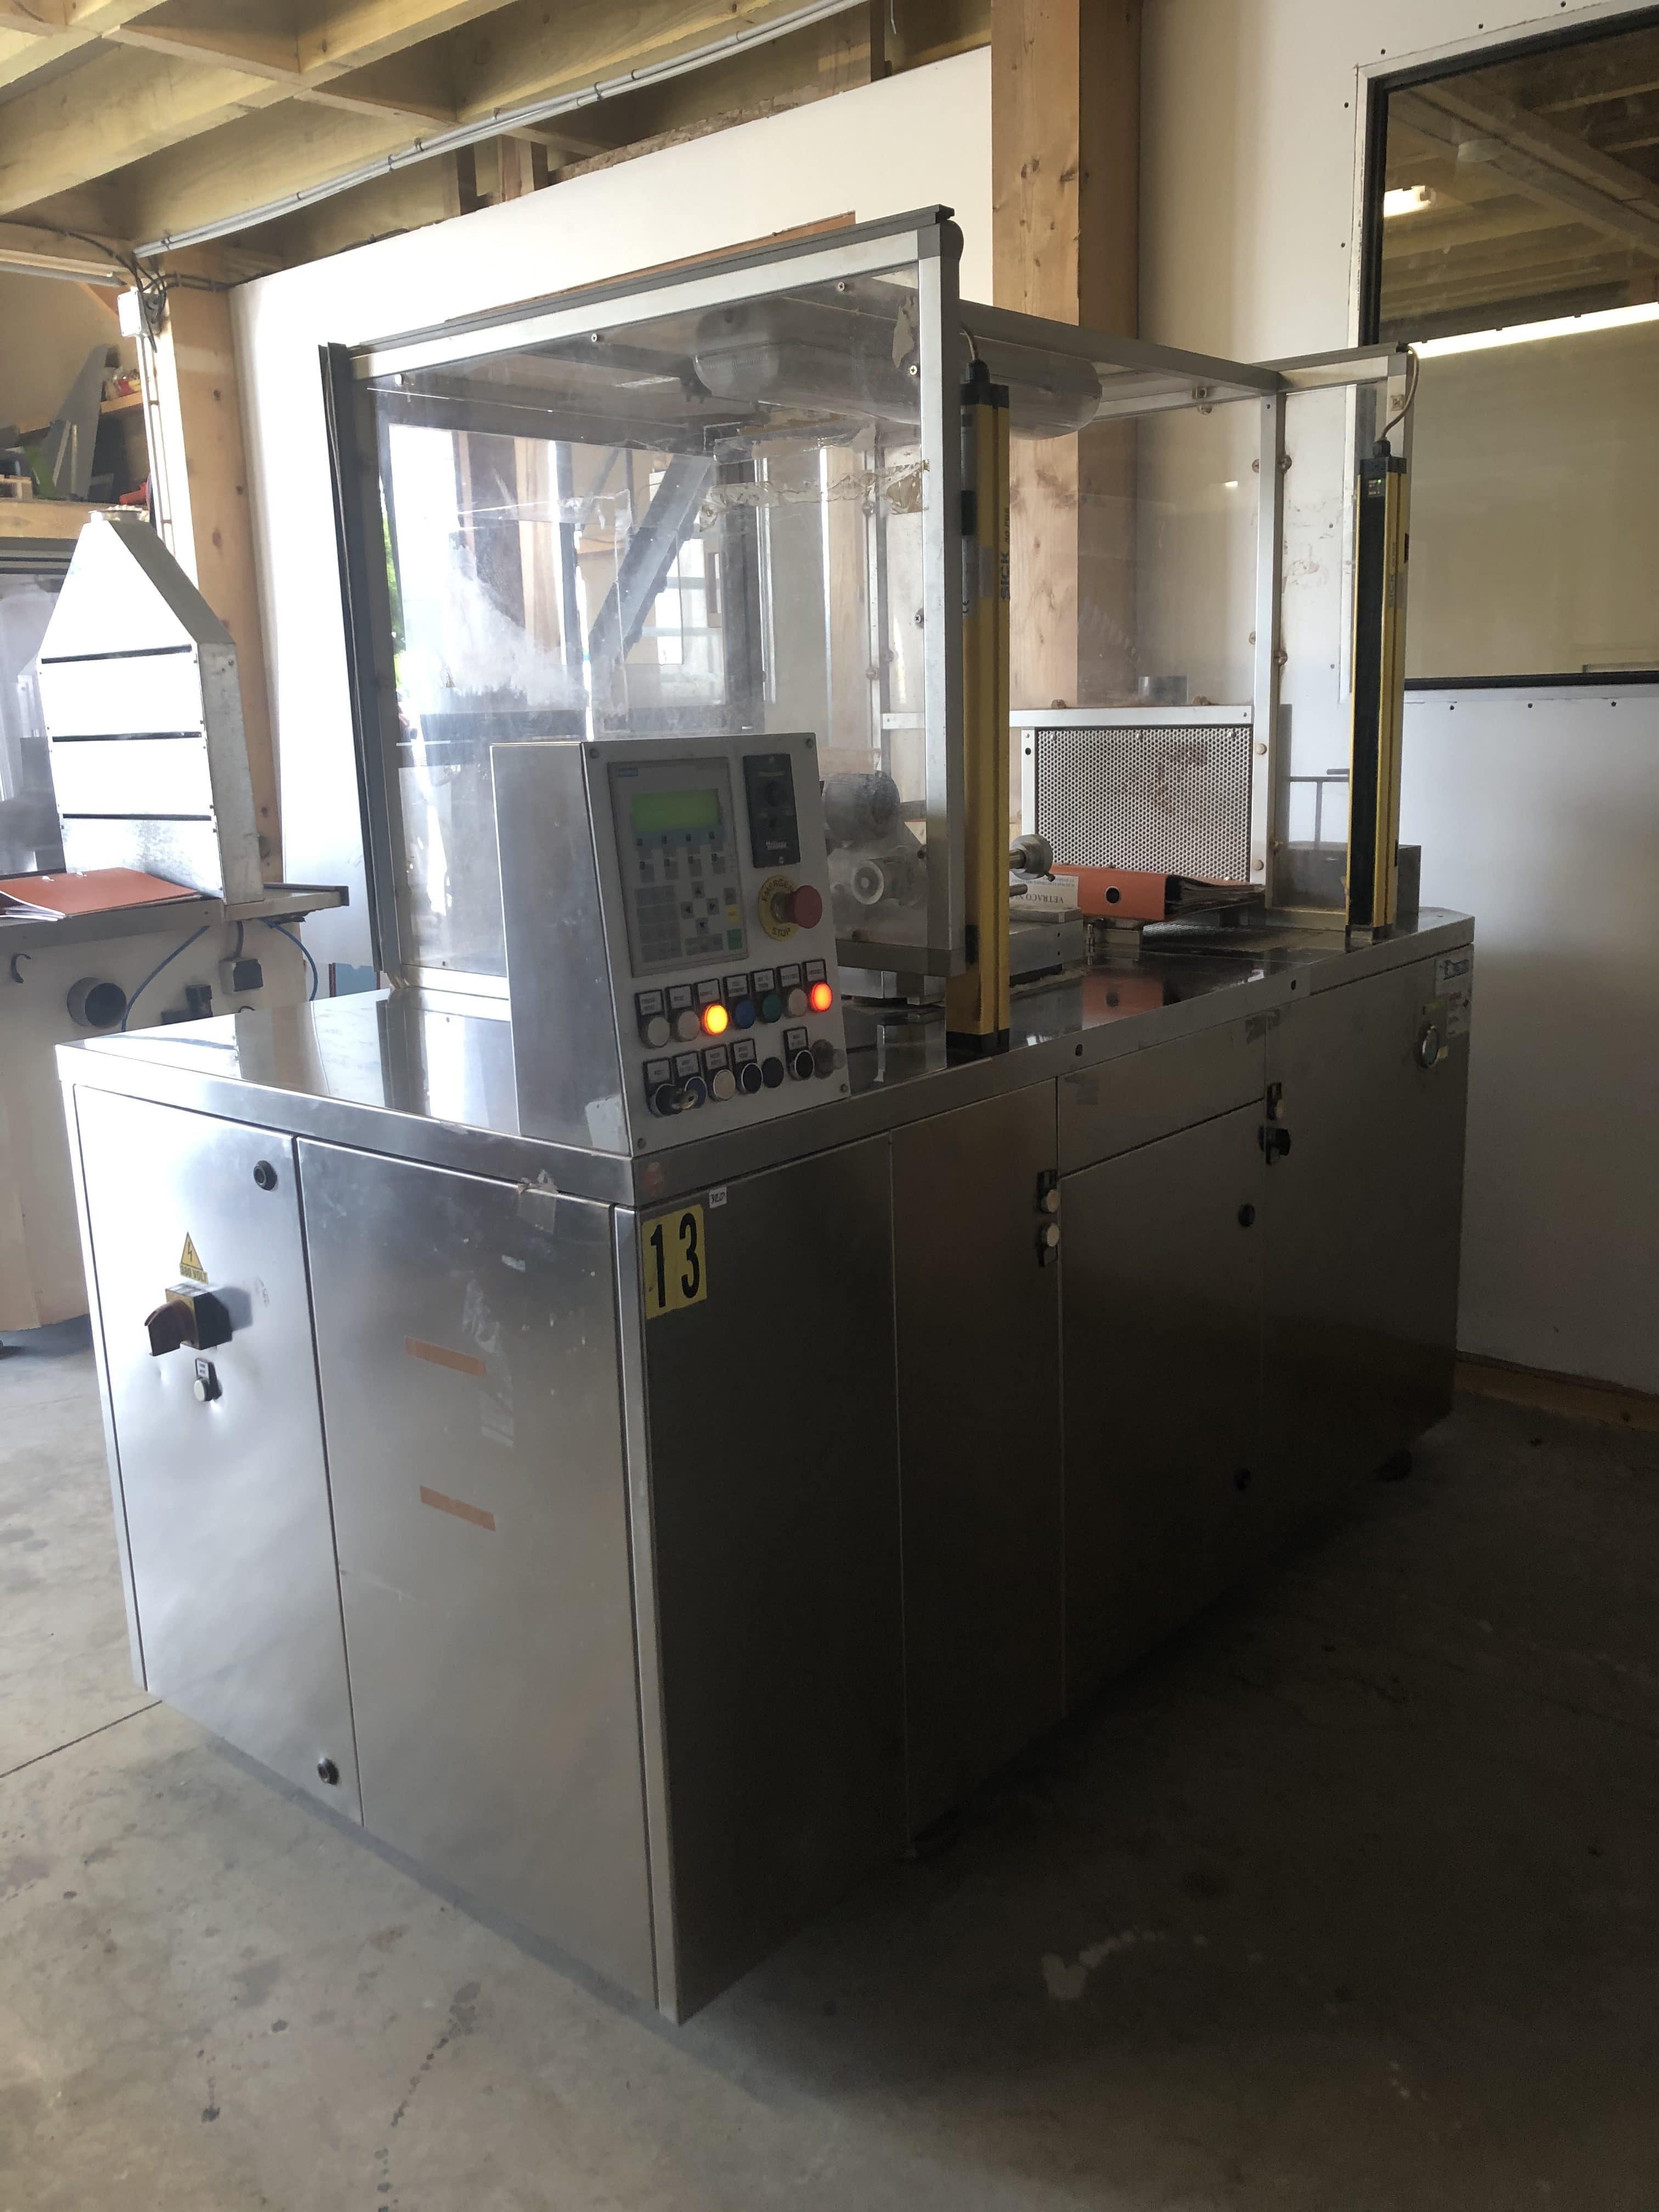 Vetraco - Compacting machine 024S-CV-80/99